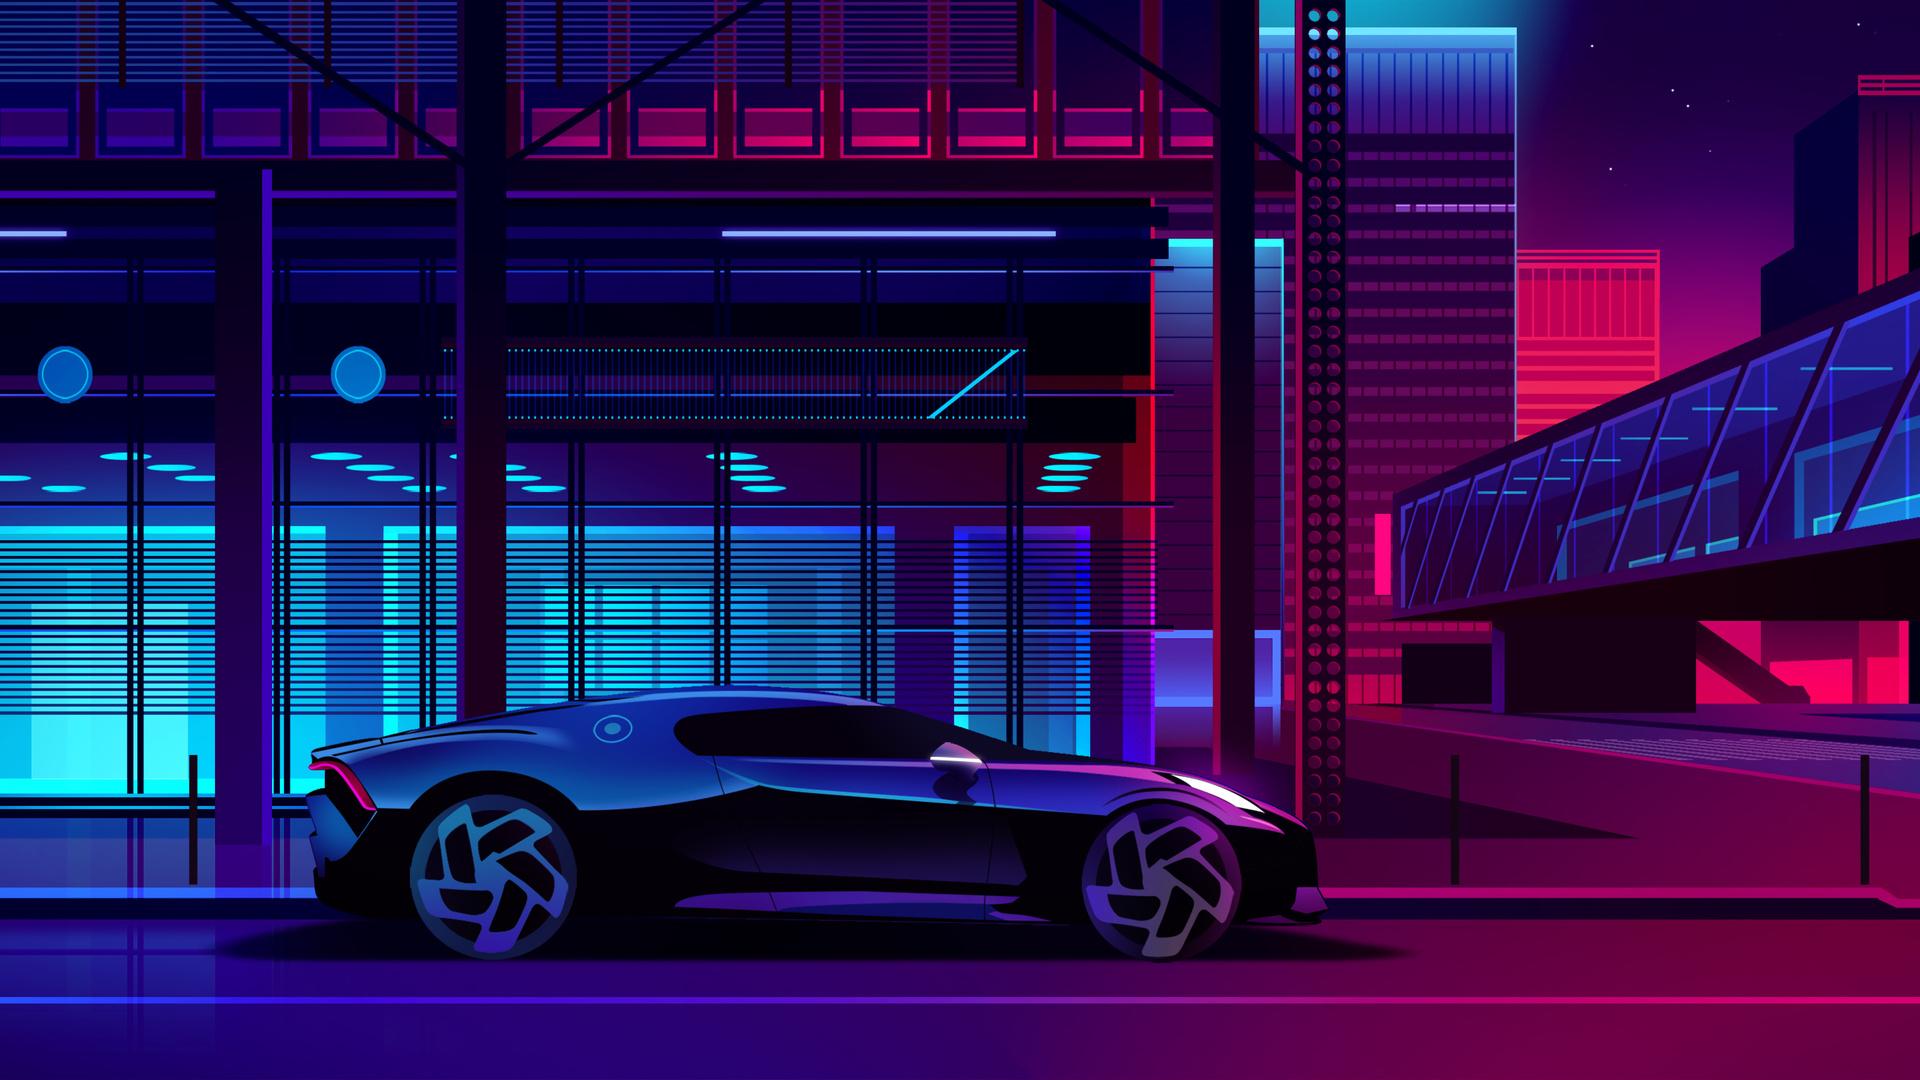 1920x1080 Bugatti Noire Neon Art Laptop Full HD 1080P HD 4k Wallpapers, Images, Backgrounds ...